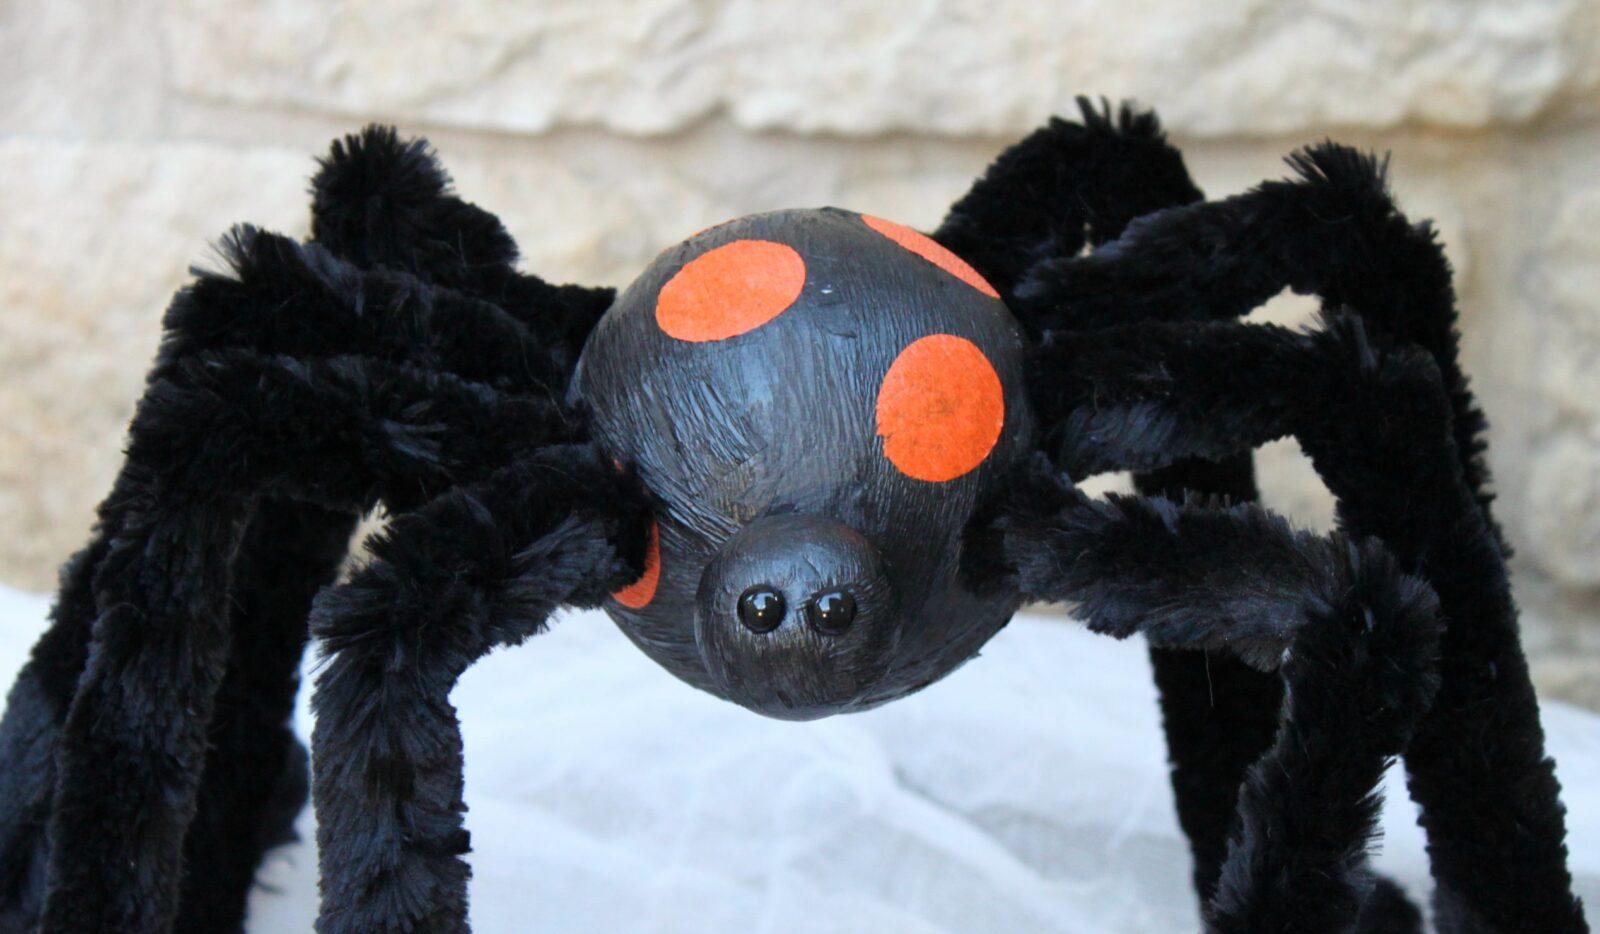 Giant Spider Diy Morena S Corner